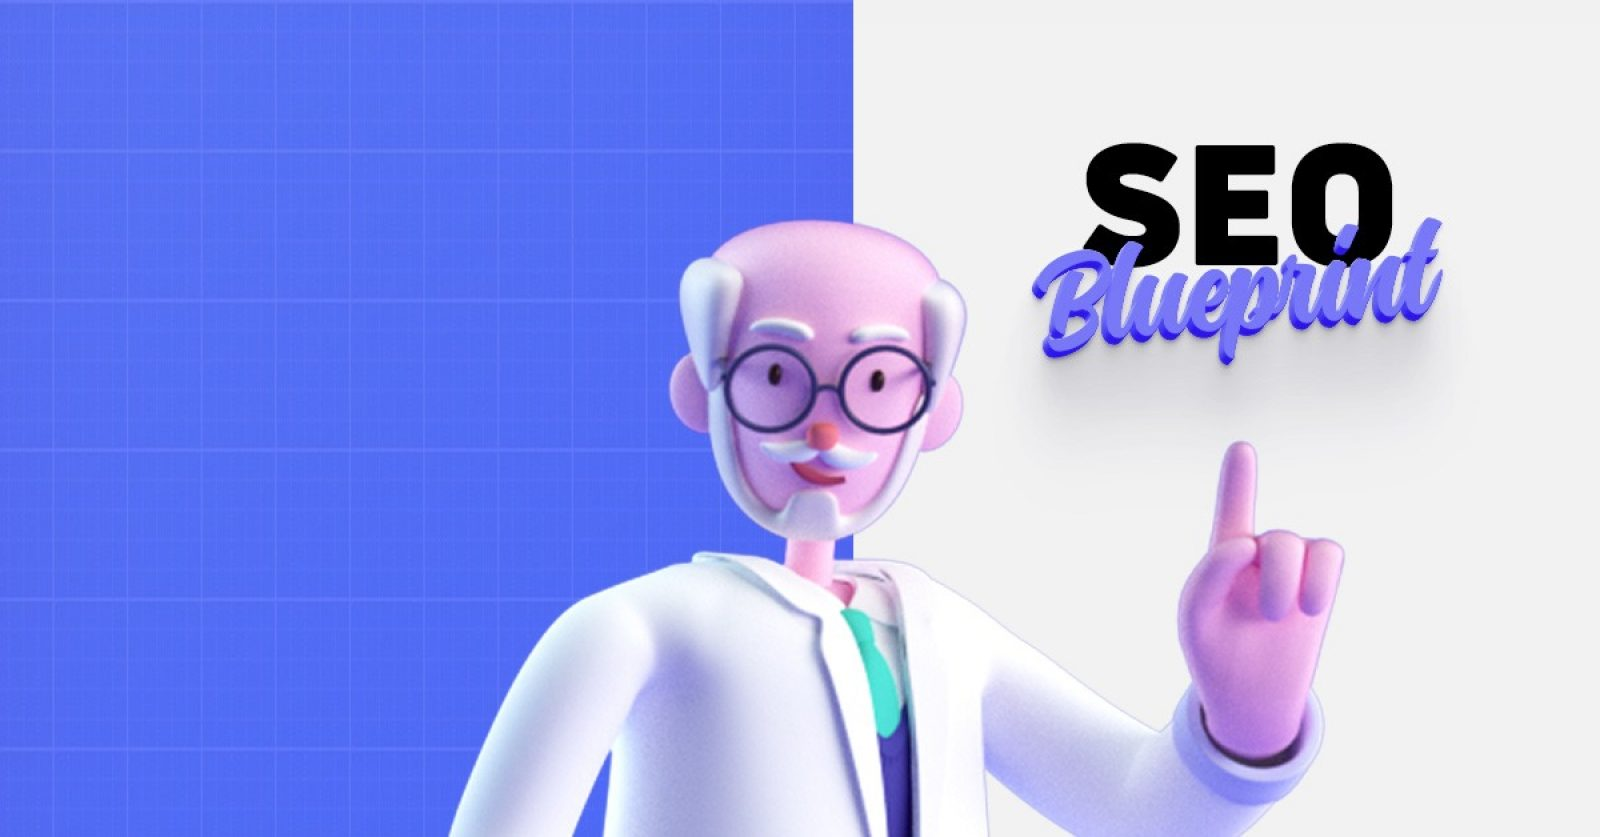 Digital Marketing Blueprint for SEO